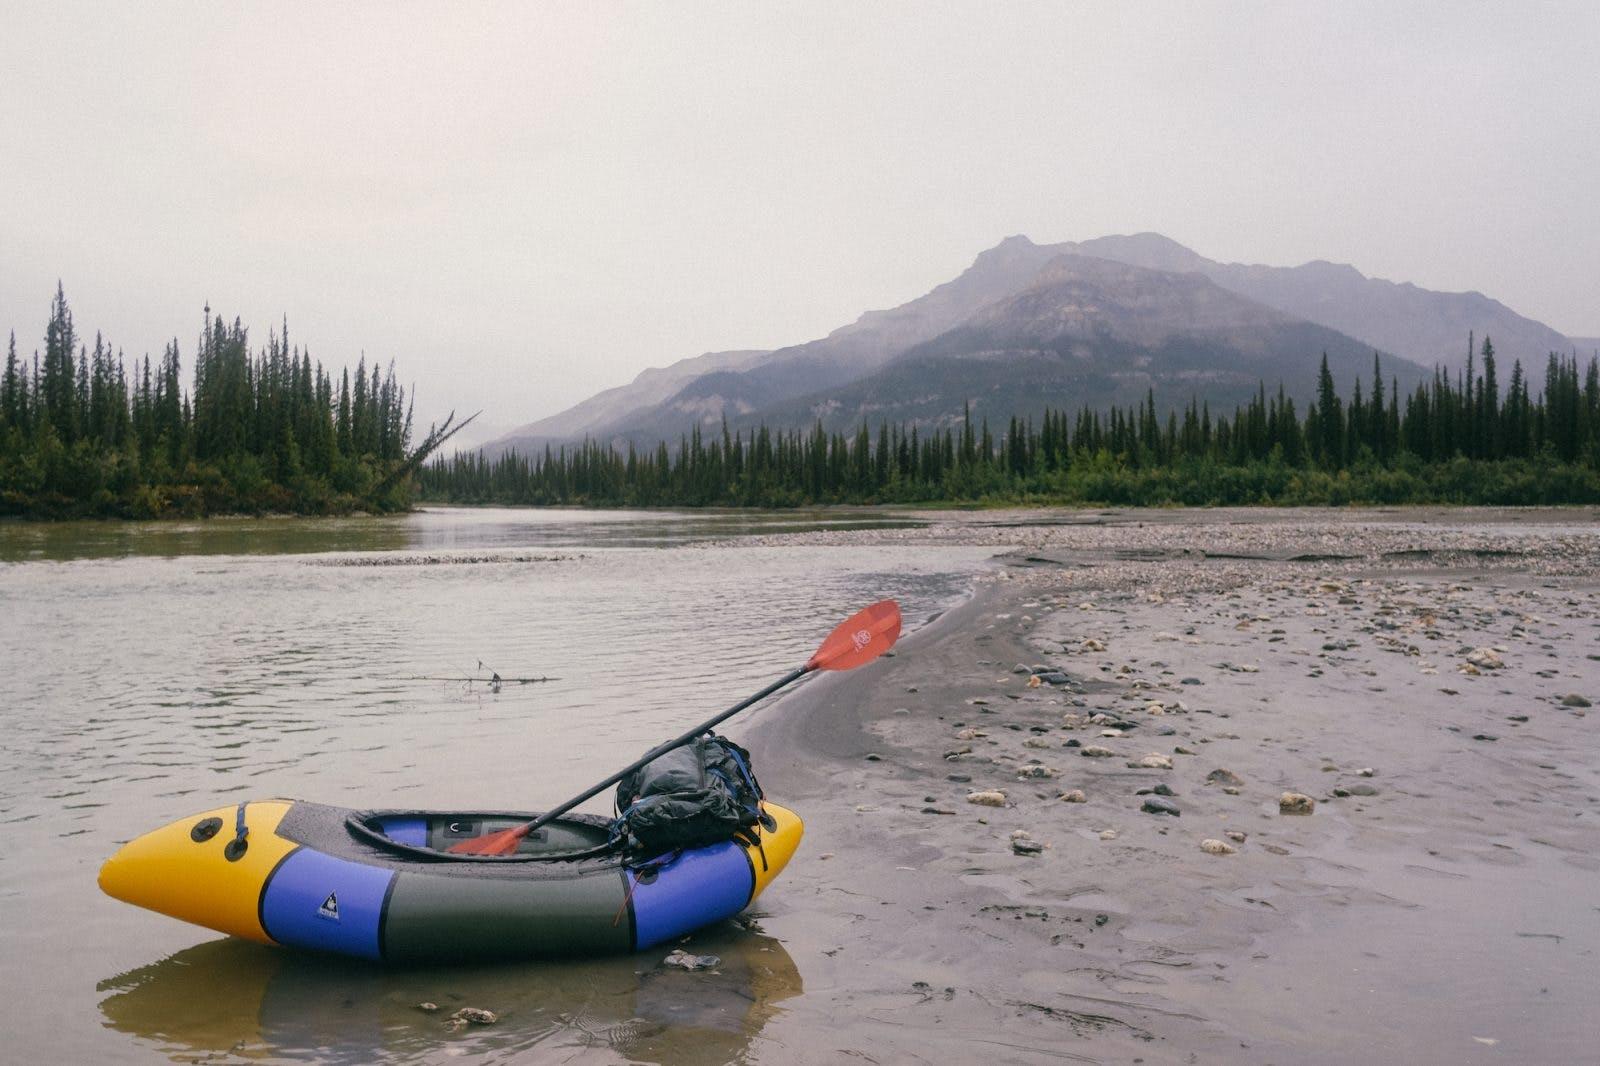 Emily Sullivan - The Cairn Project - Solo Alaska Adventure